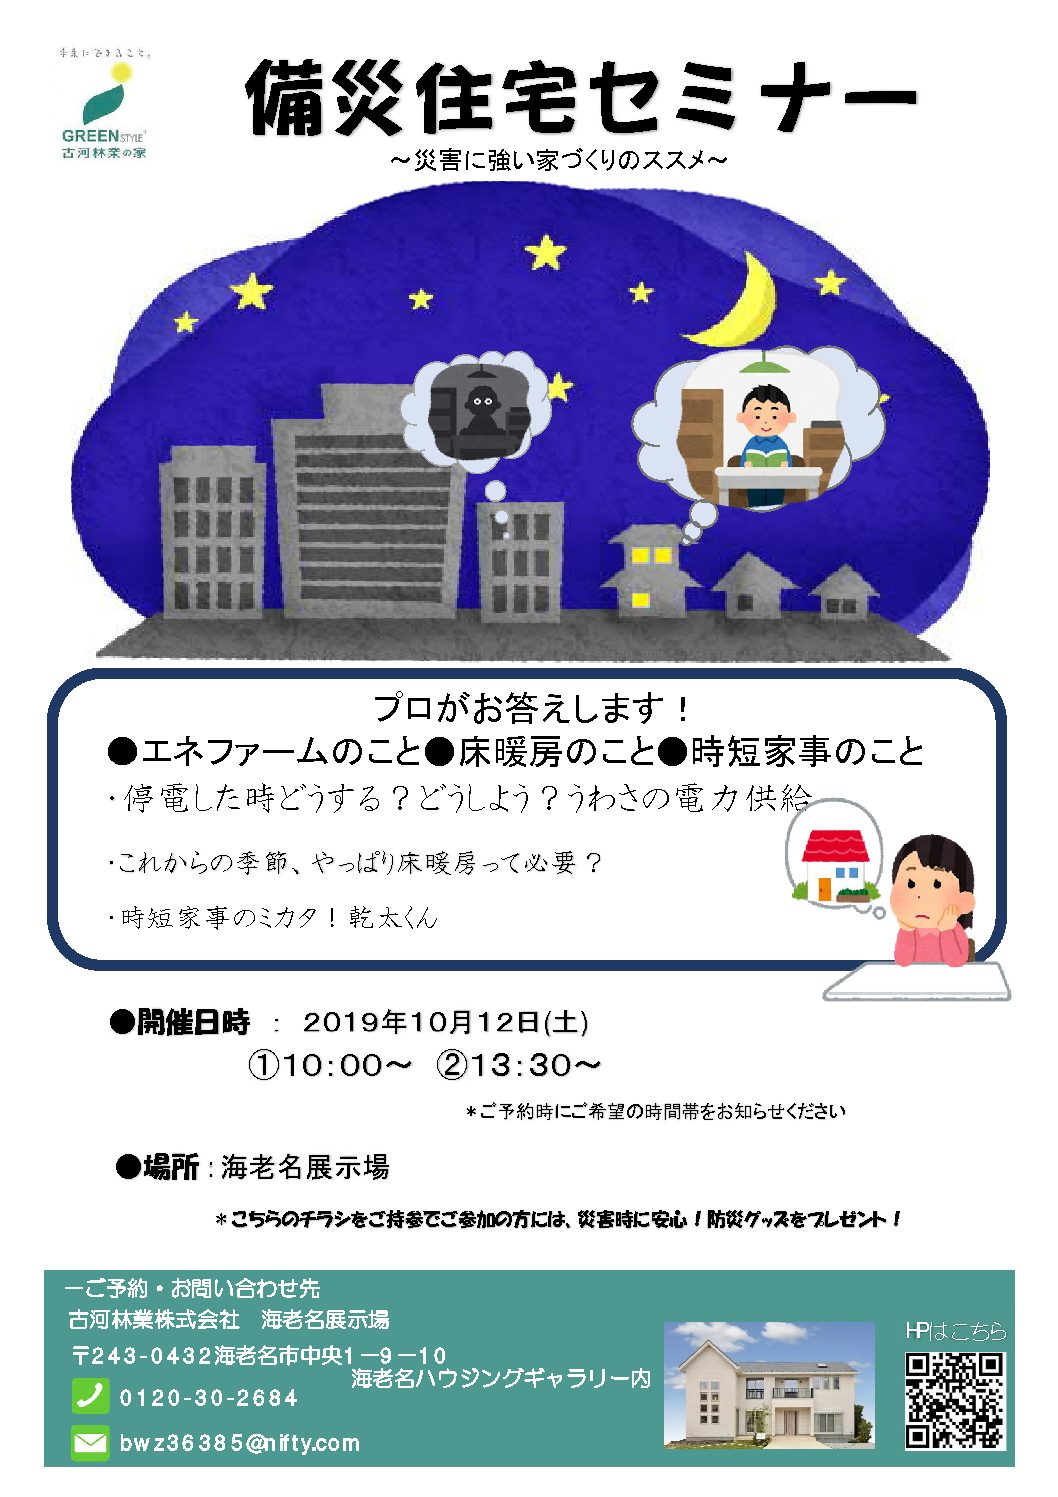 三連休初日は「備災セミナー」開催!【海老名展示場】